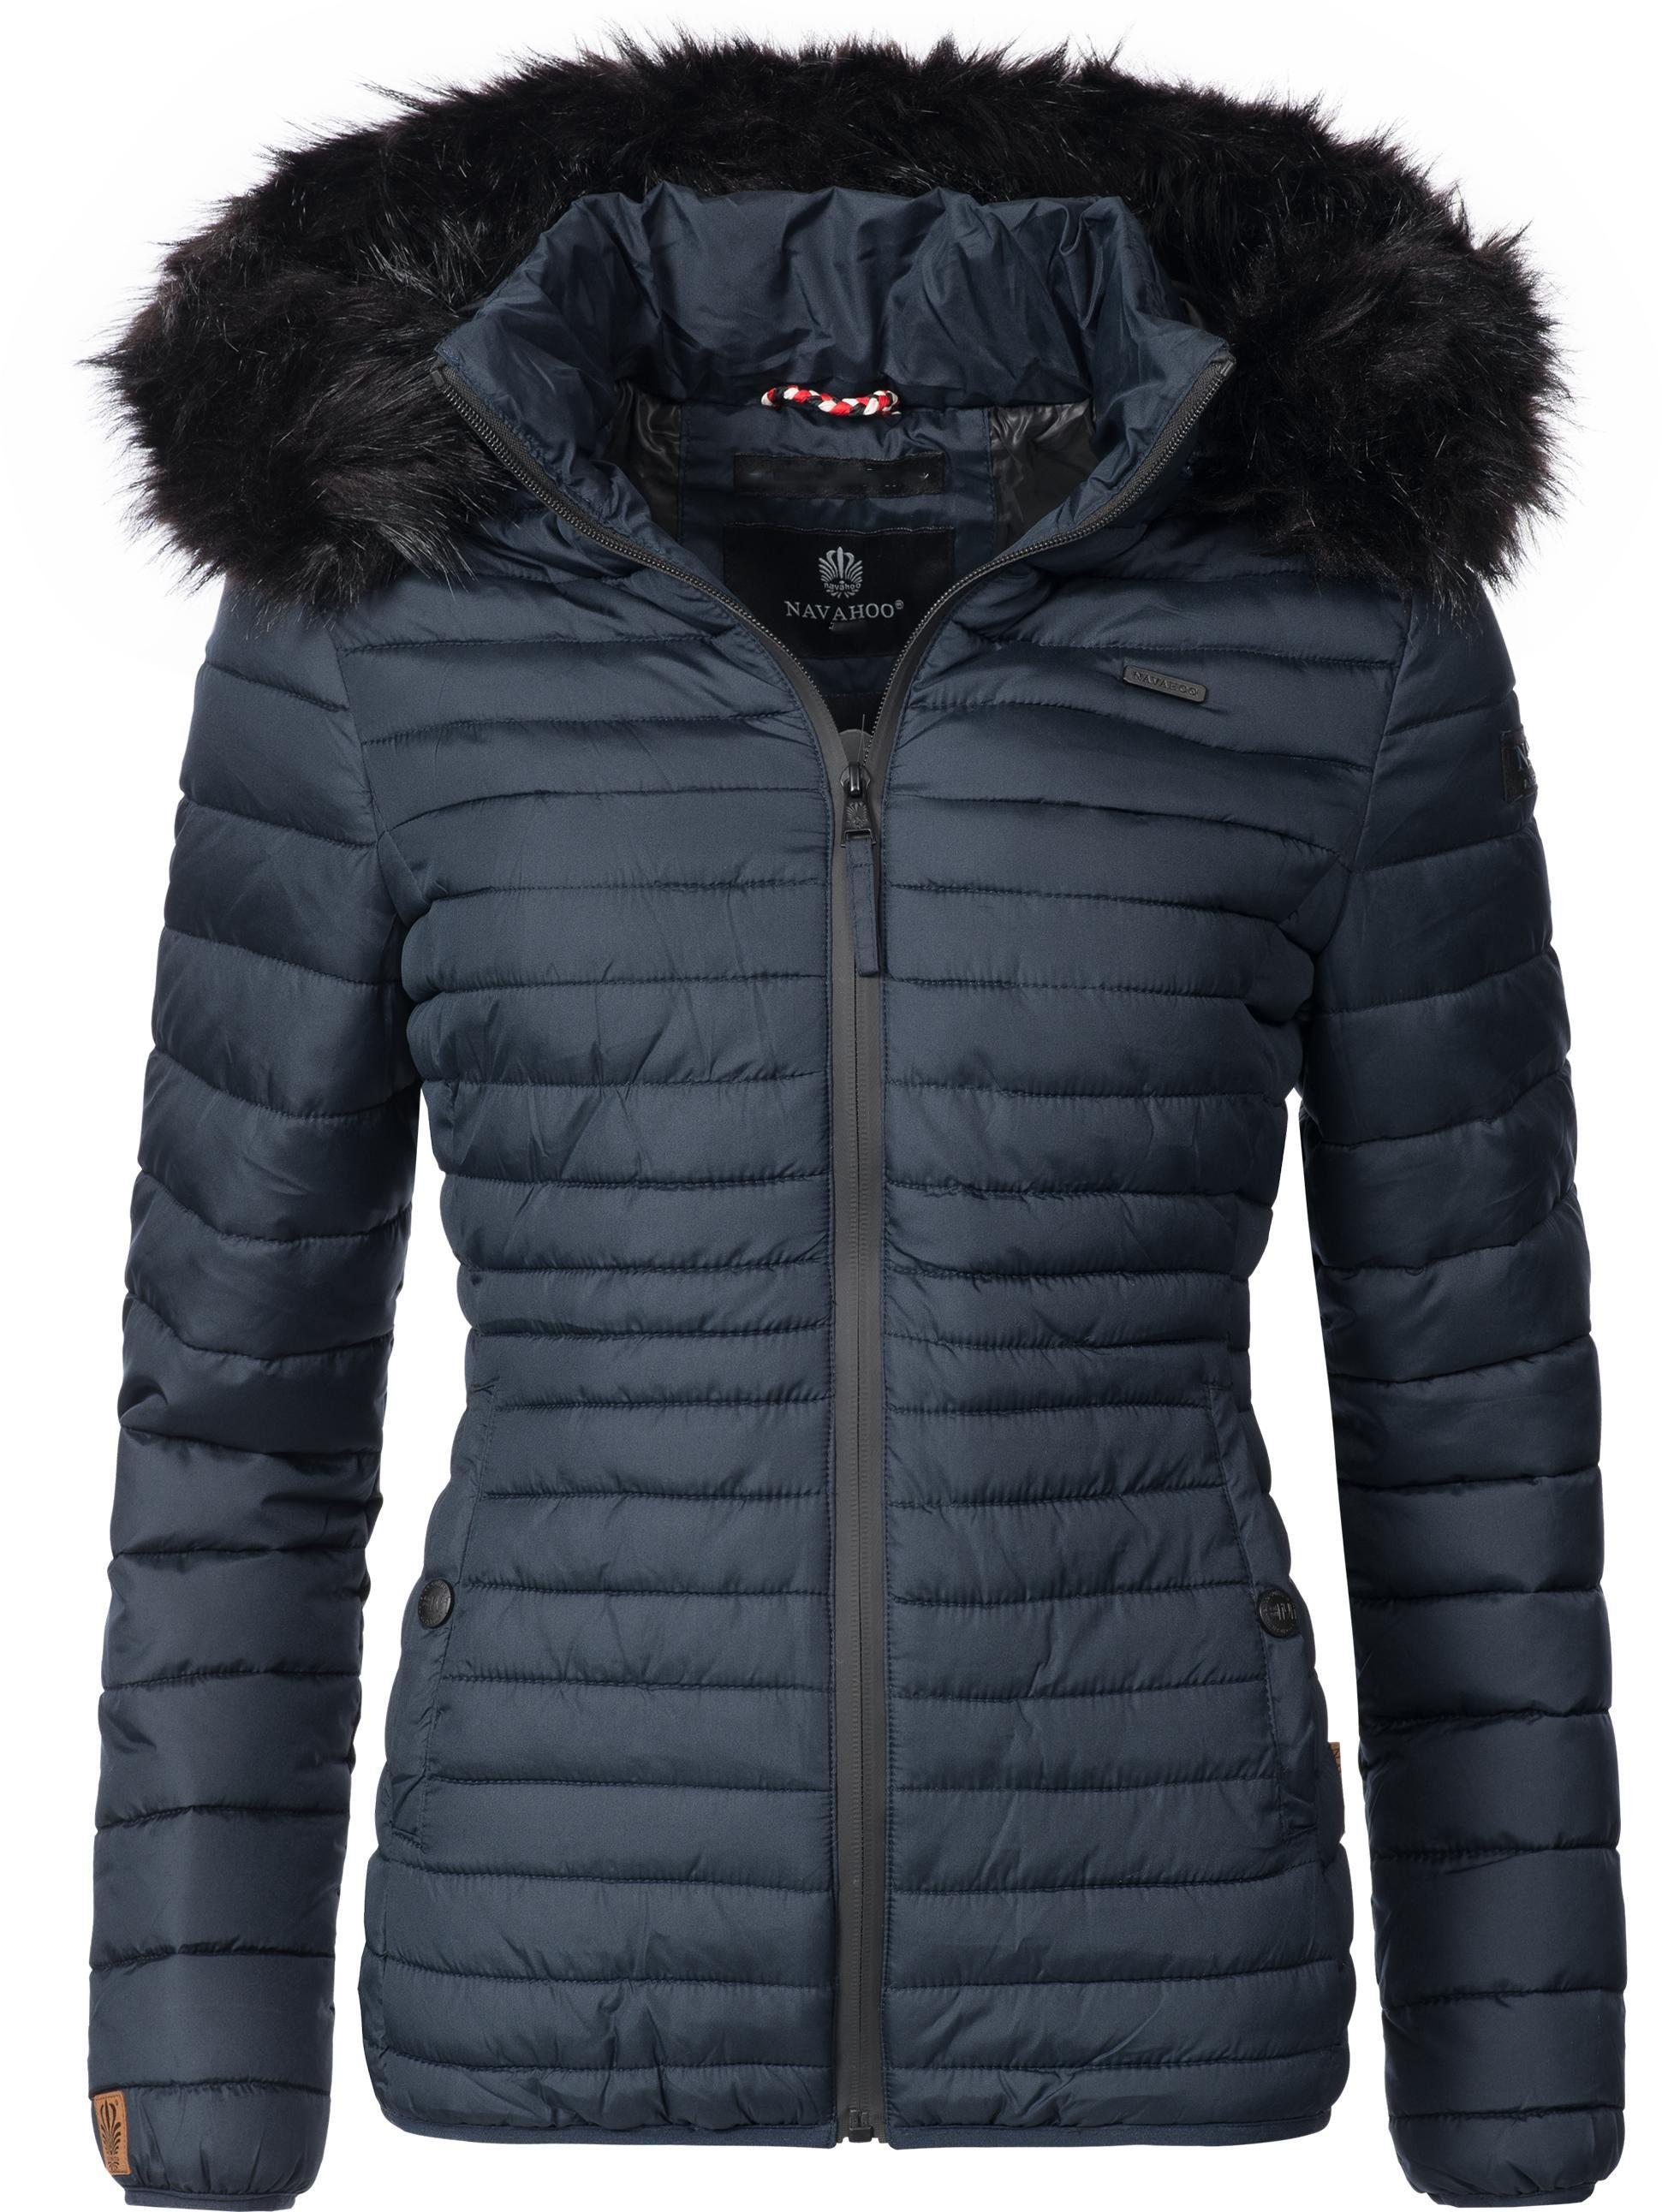 Navahoo Steppjacke »Arana« modische Damen Winterjacke mit großem Kunstfell online kaufen | OTTO